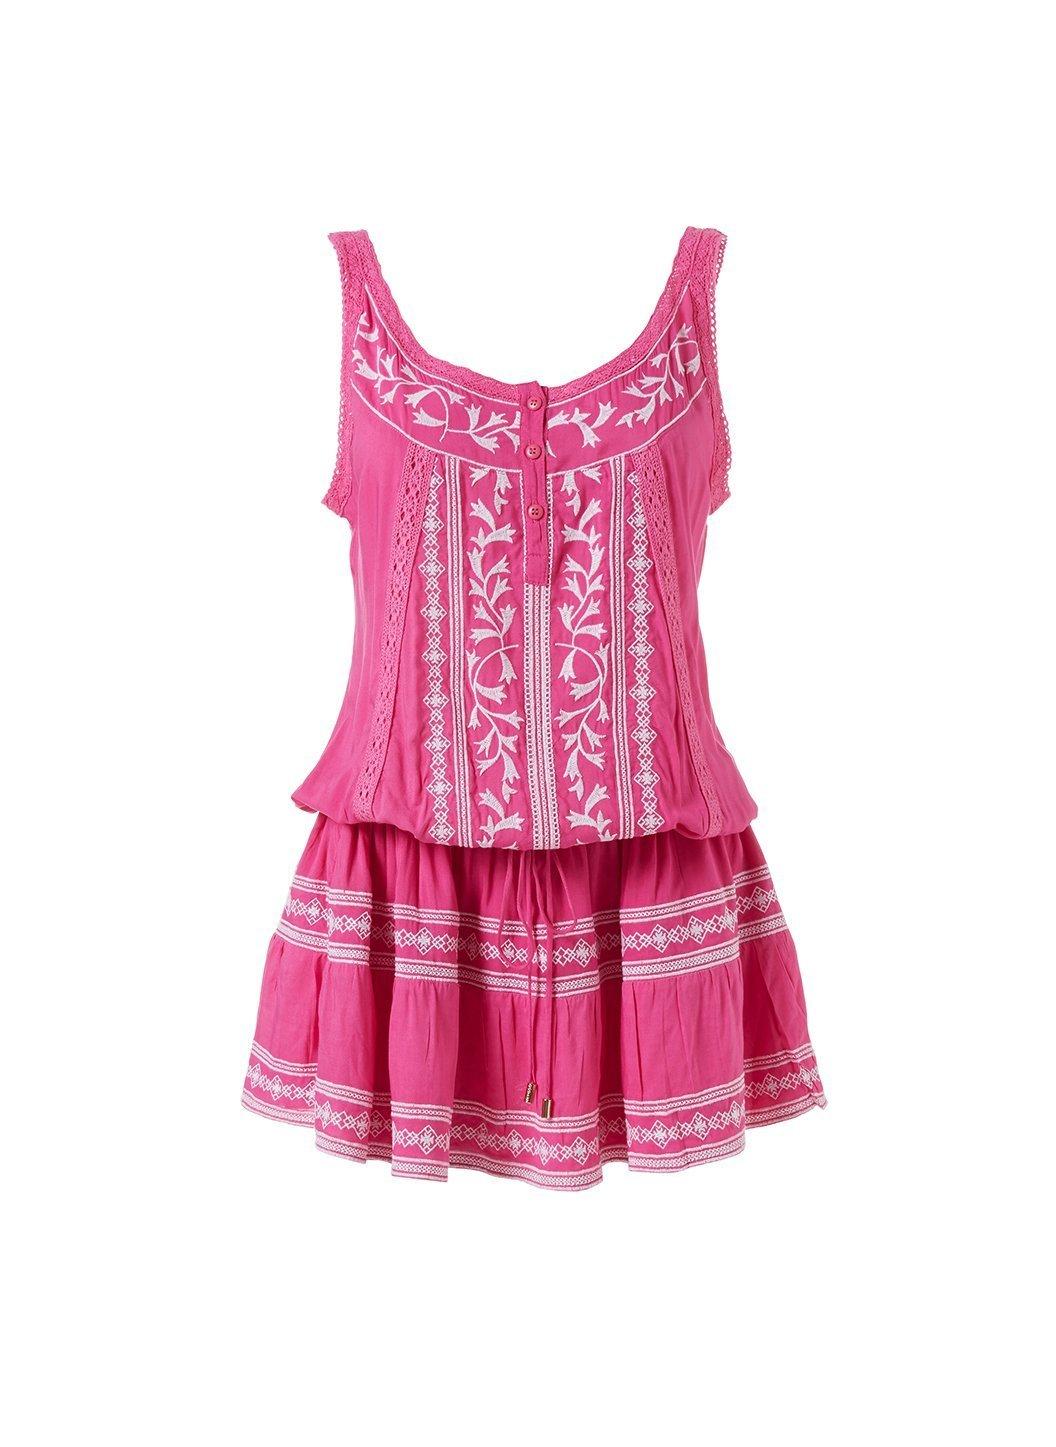 Jaz_Flamingo_Dress_Cutouts_1056x.progressive